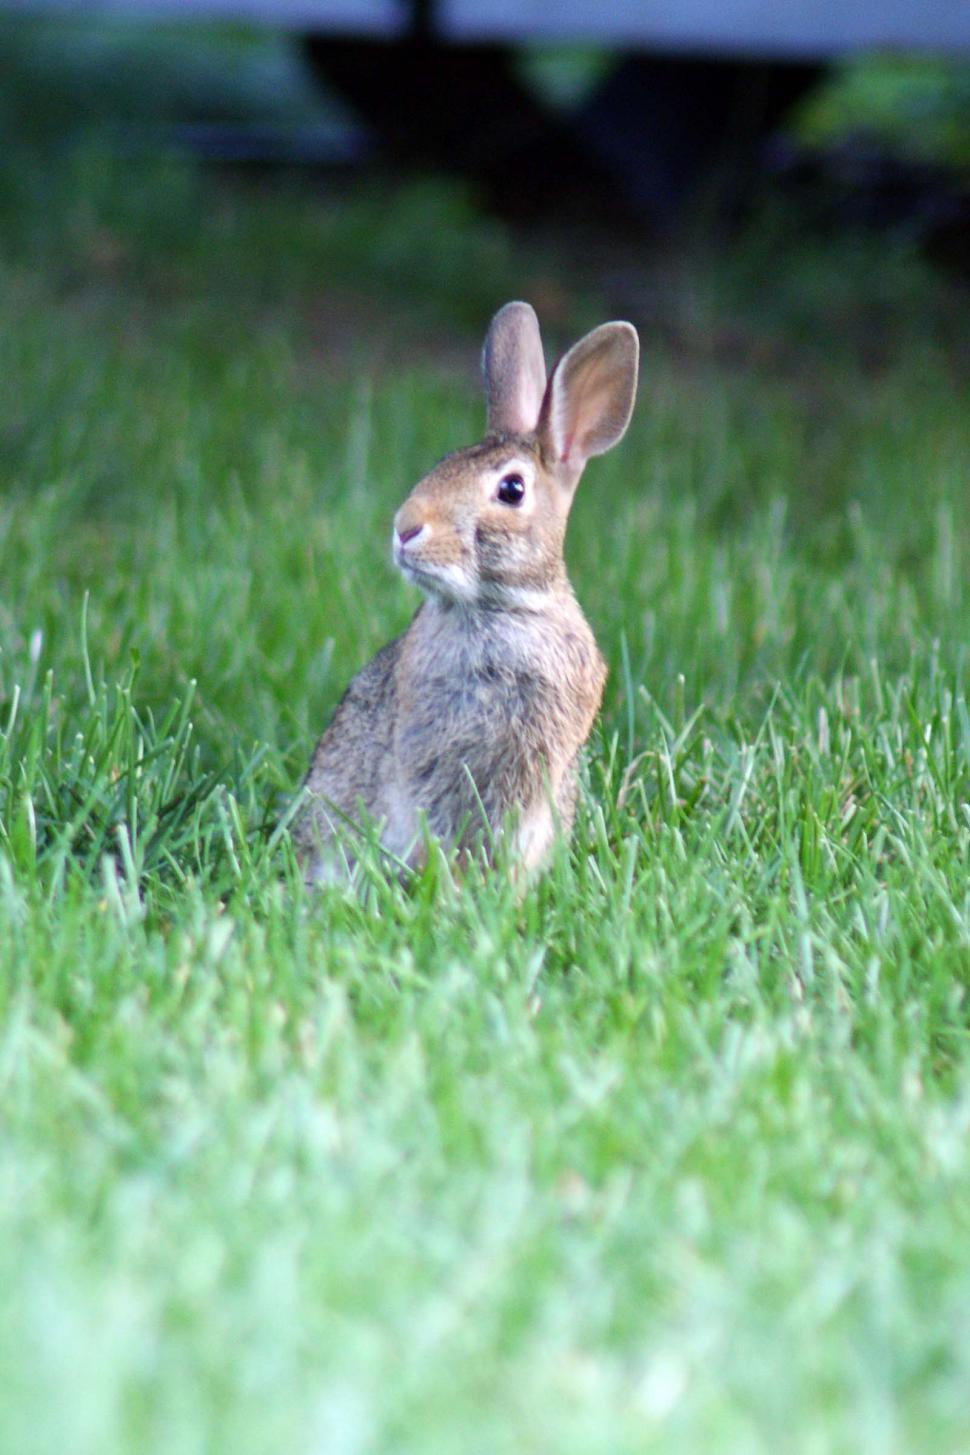 Download Free Stock HD Photo of RabbitPose Online